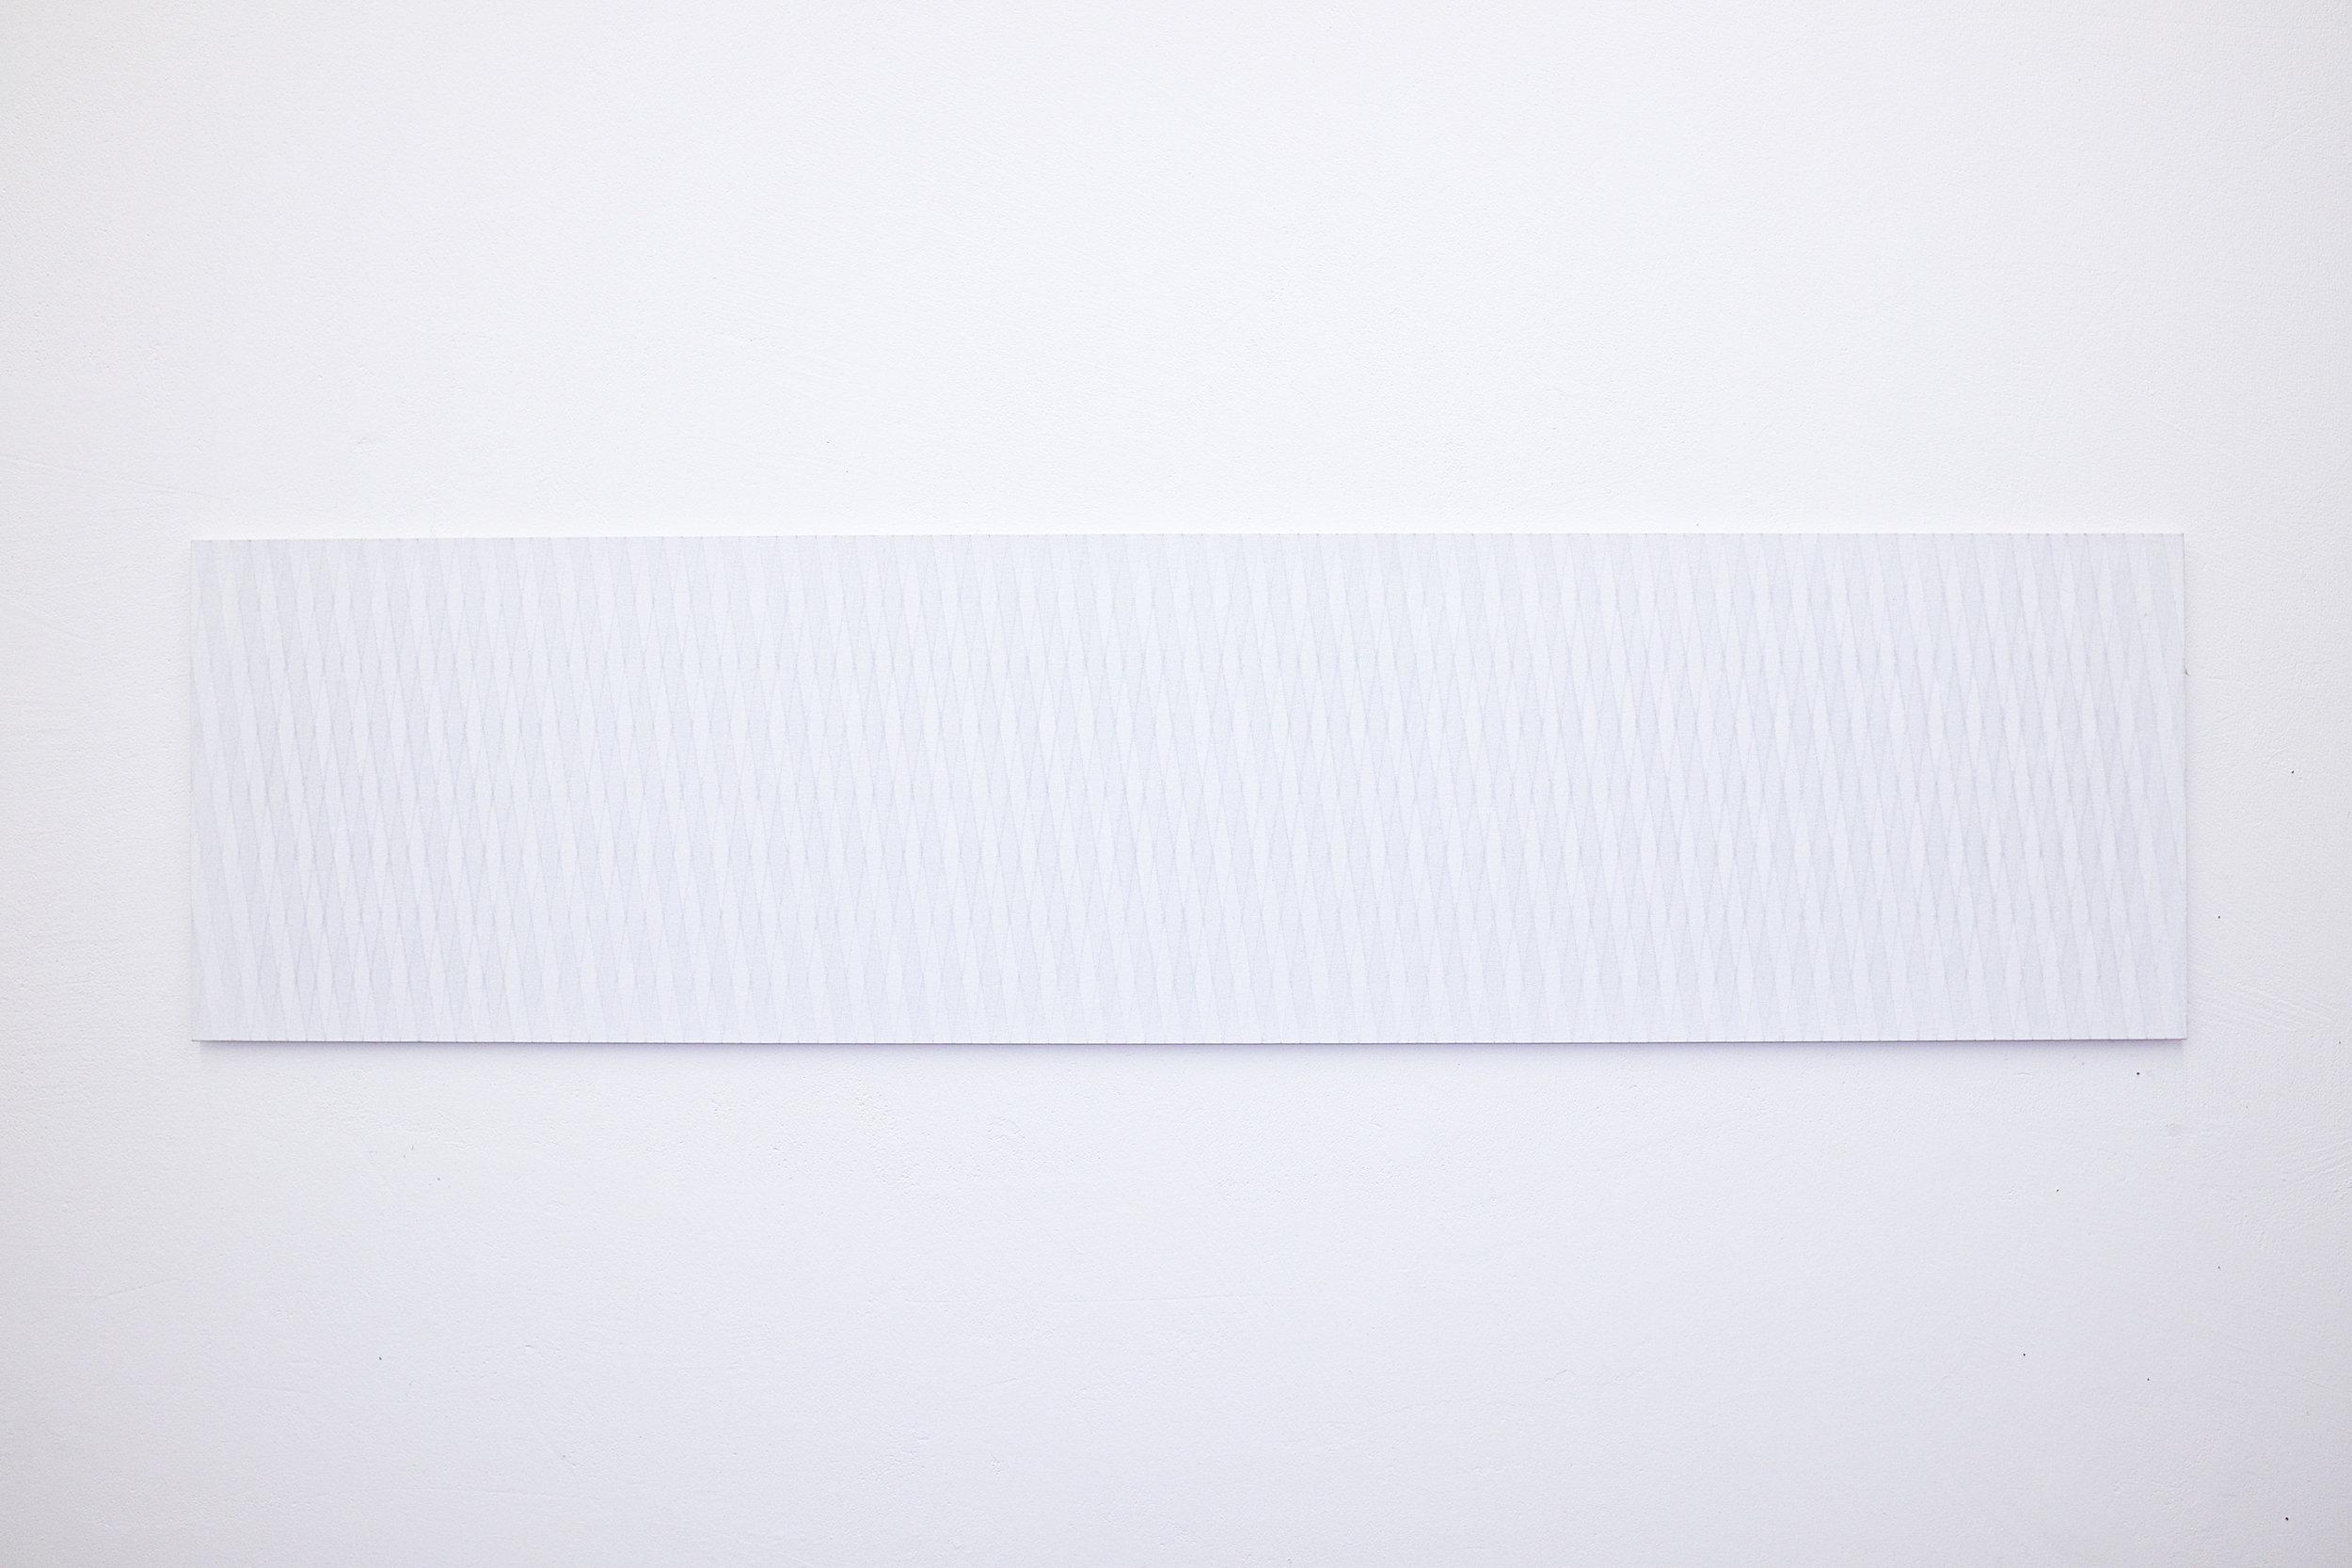 bild nr. 10/2014 - 50 x 200cm - acryl auf baumwolle/alu